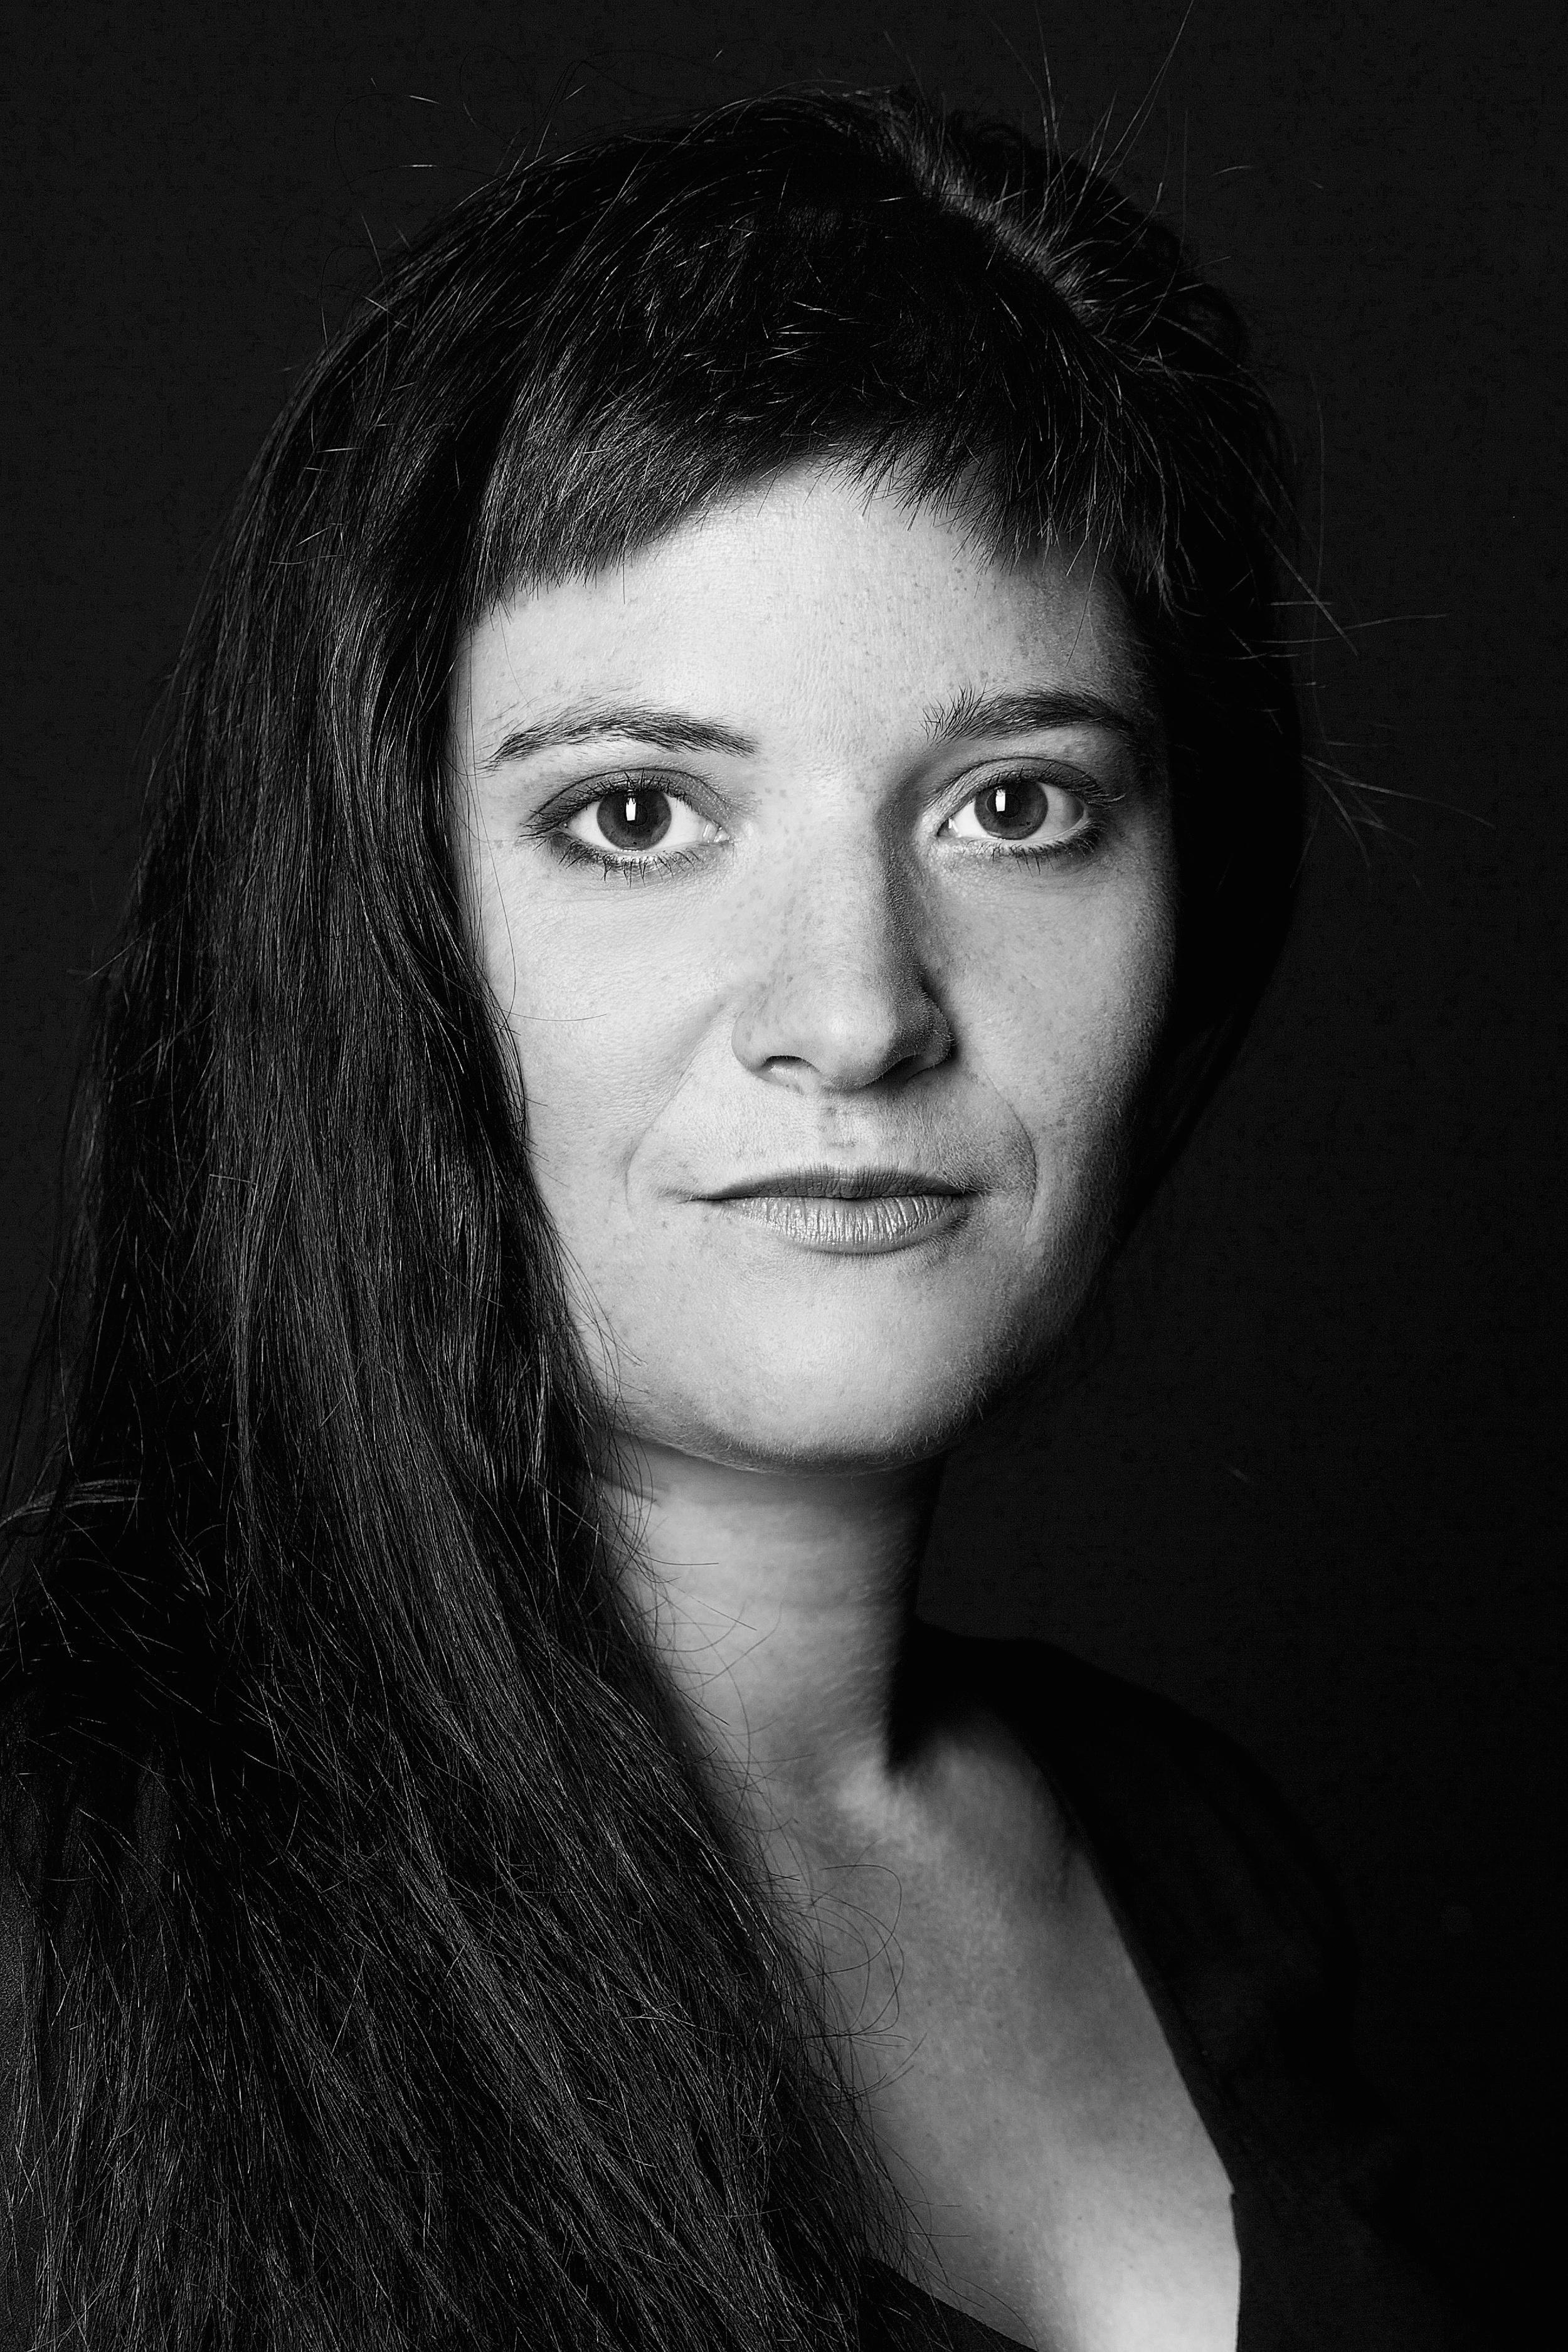 Céline-Giulia Voser